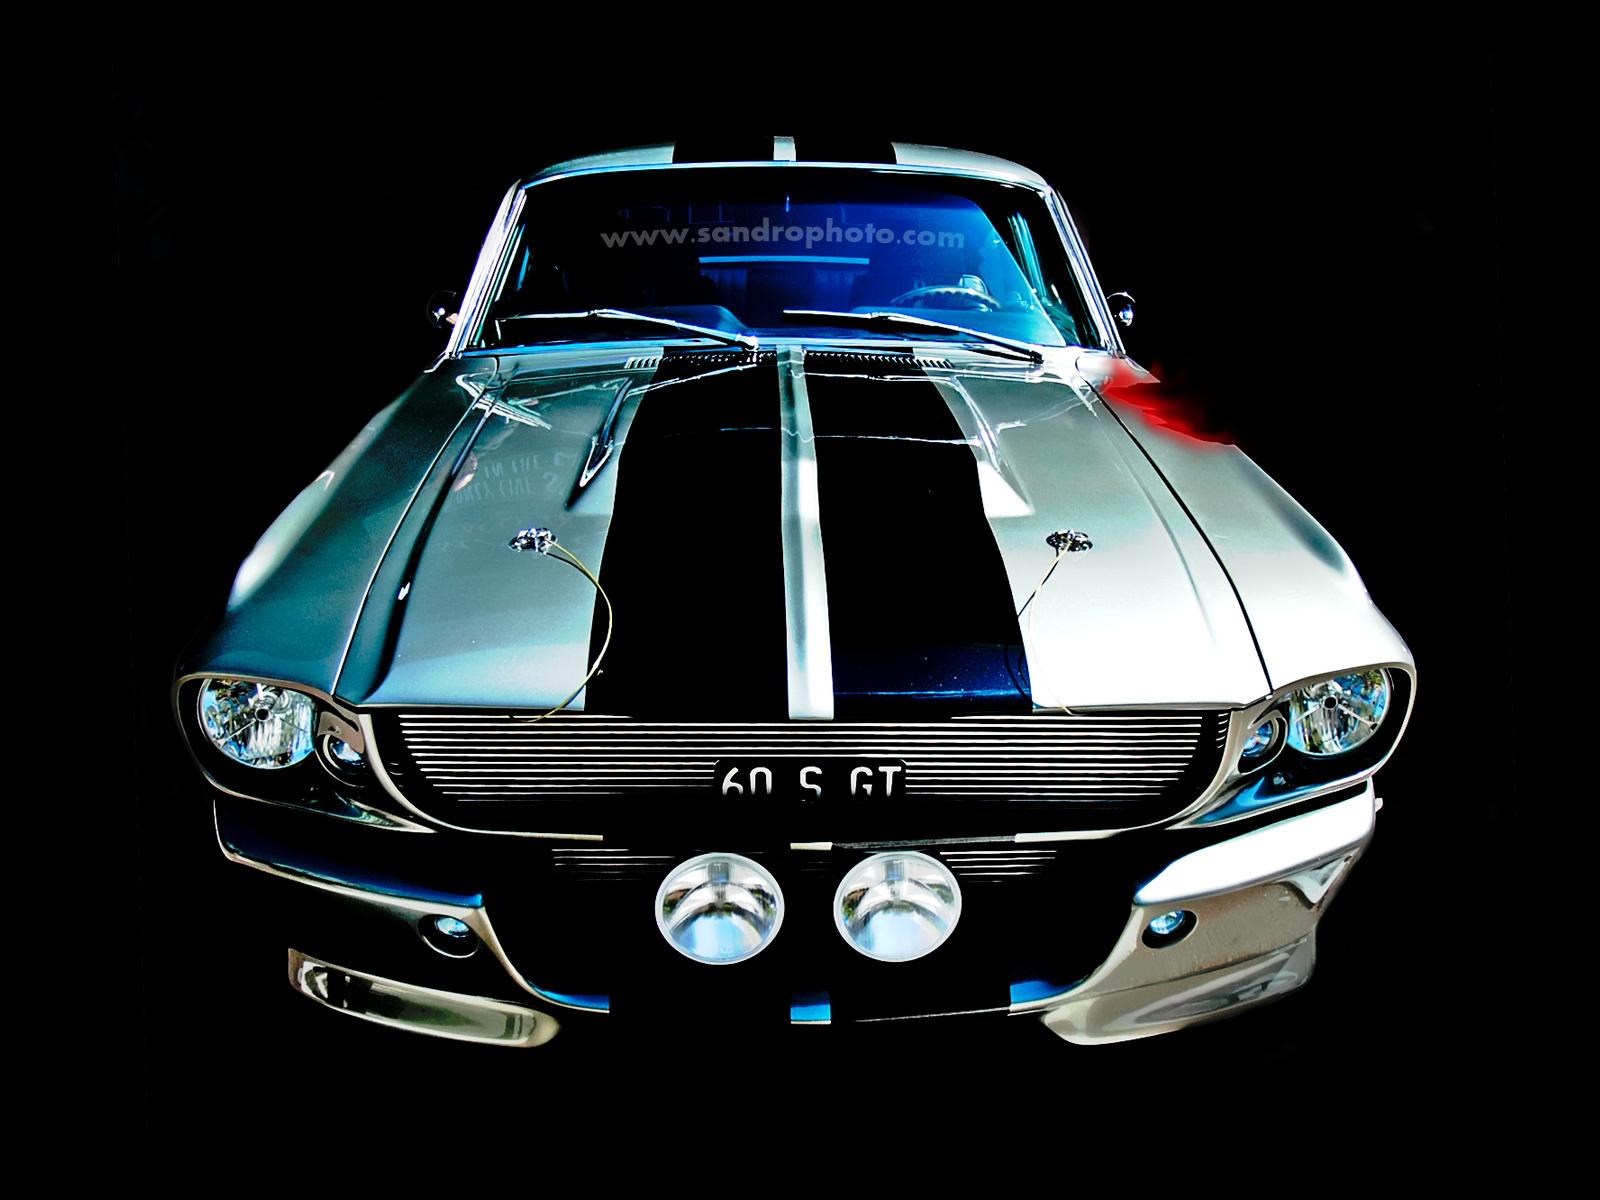 car wallpapers for desktop Car wallpapers for desktop Car wallpapers 1600x1200